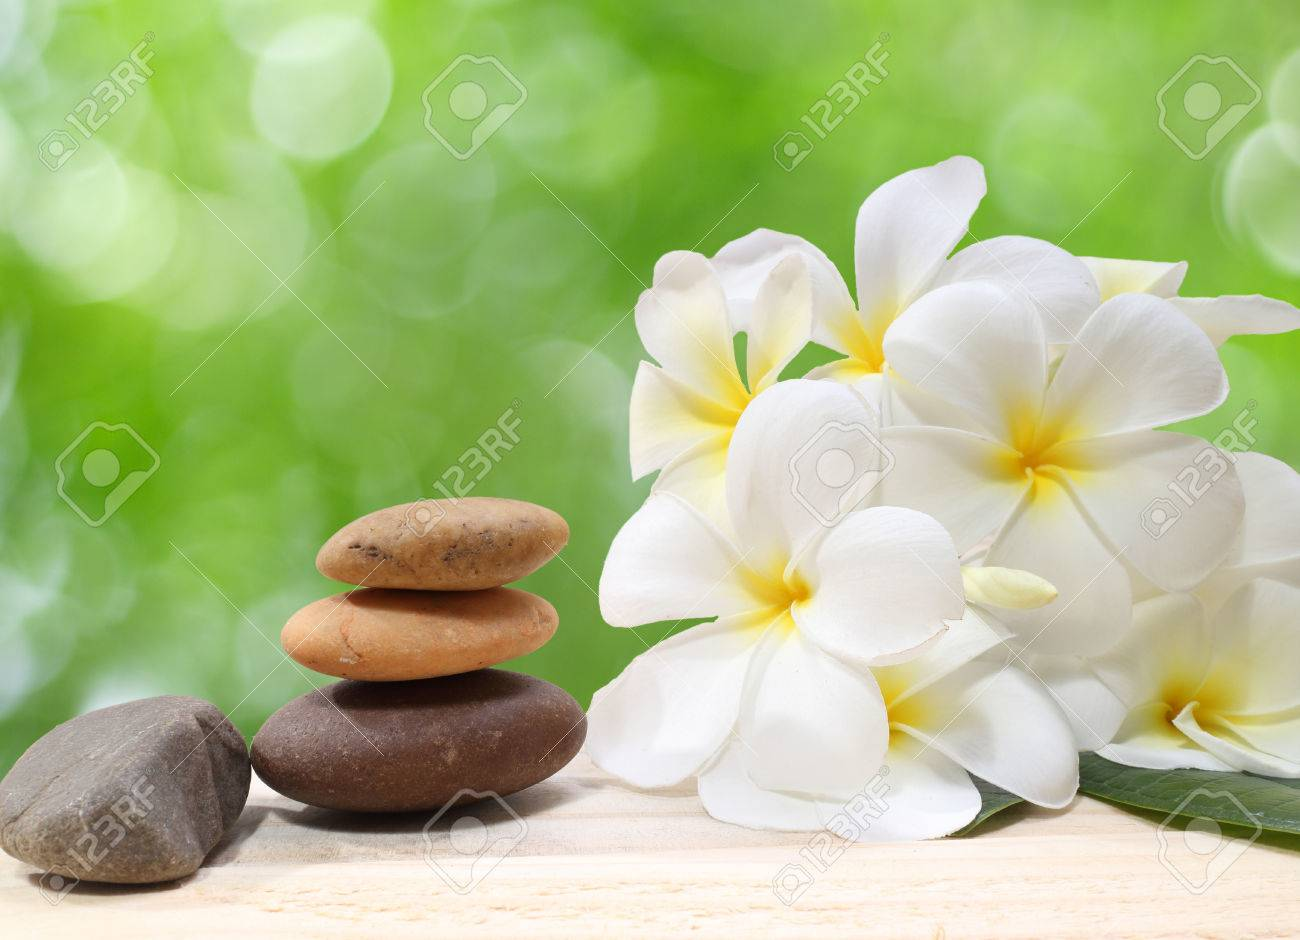 Zen spa concept background - Zen massage stones with frangipani plumeria flower - 40644780